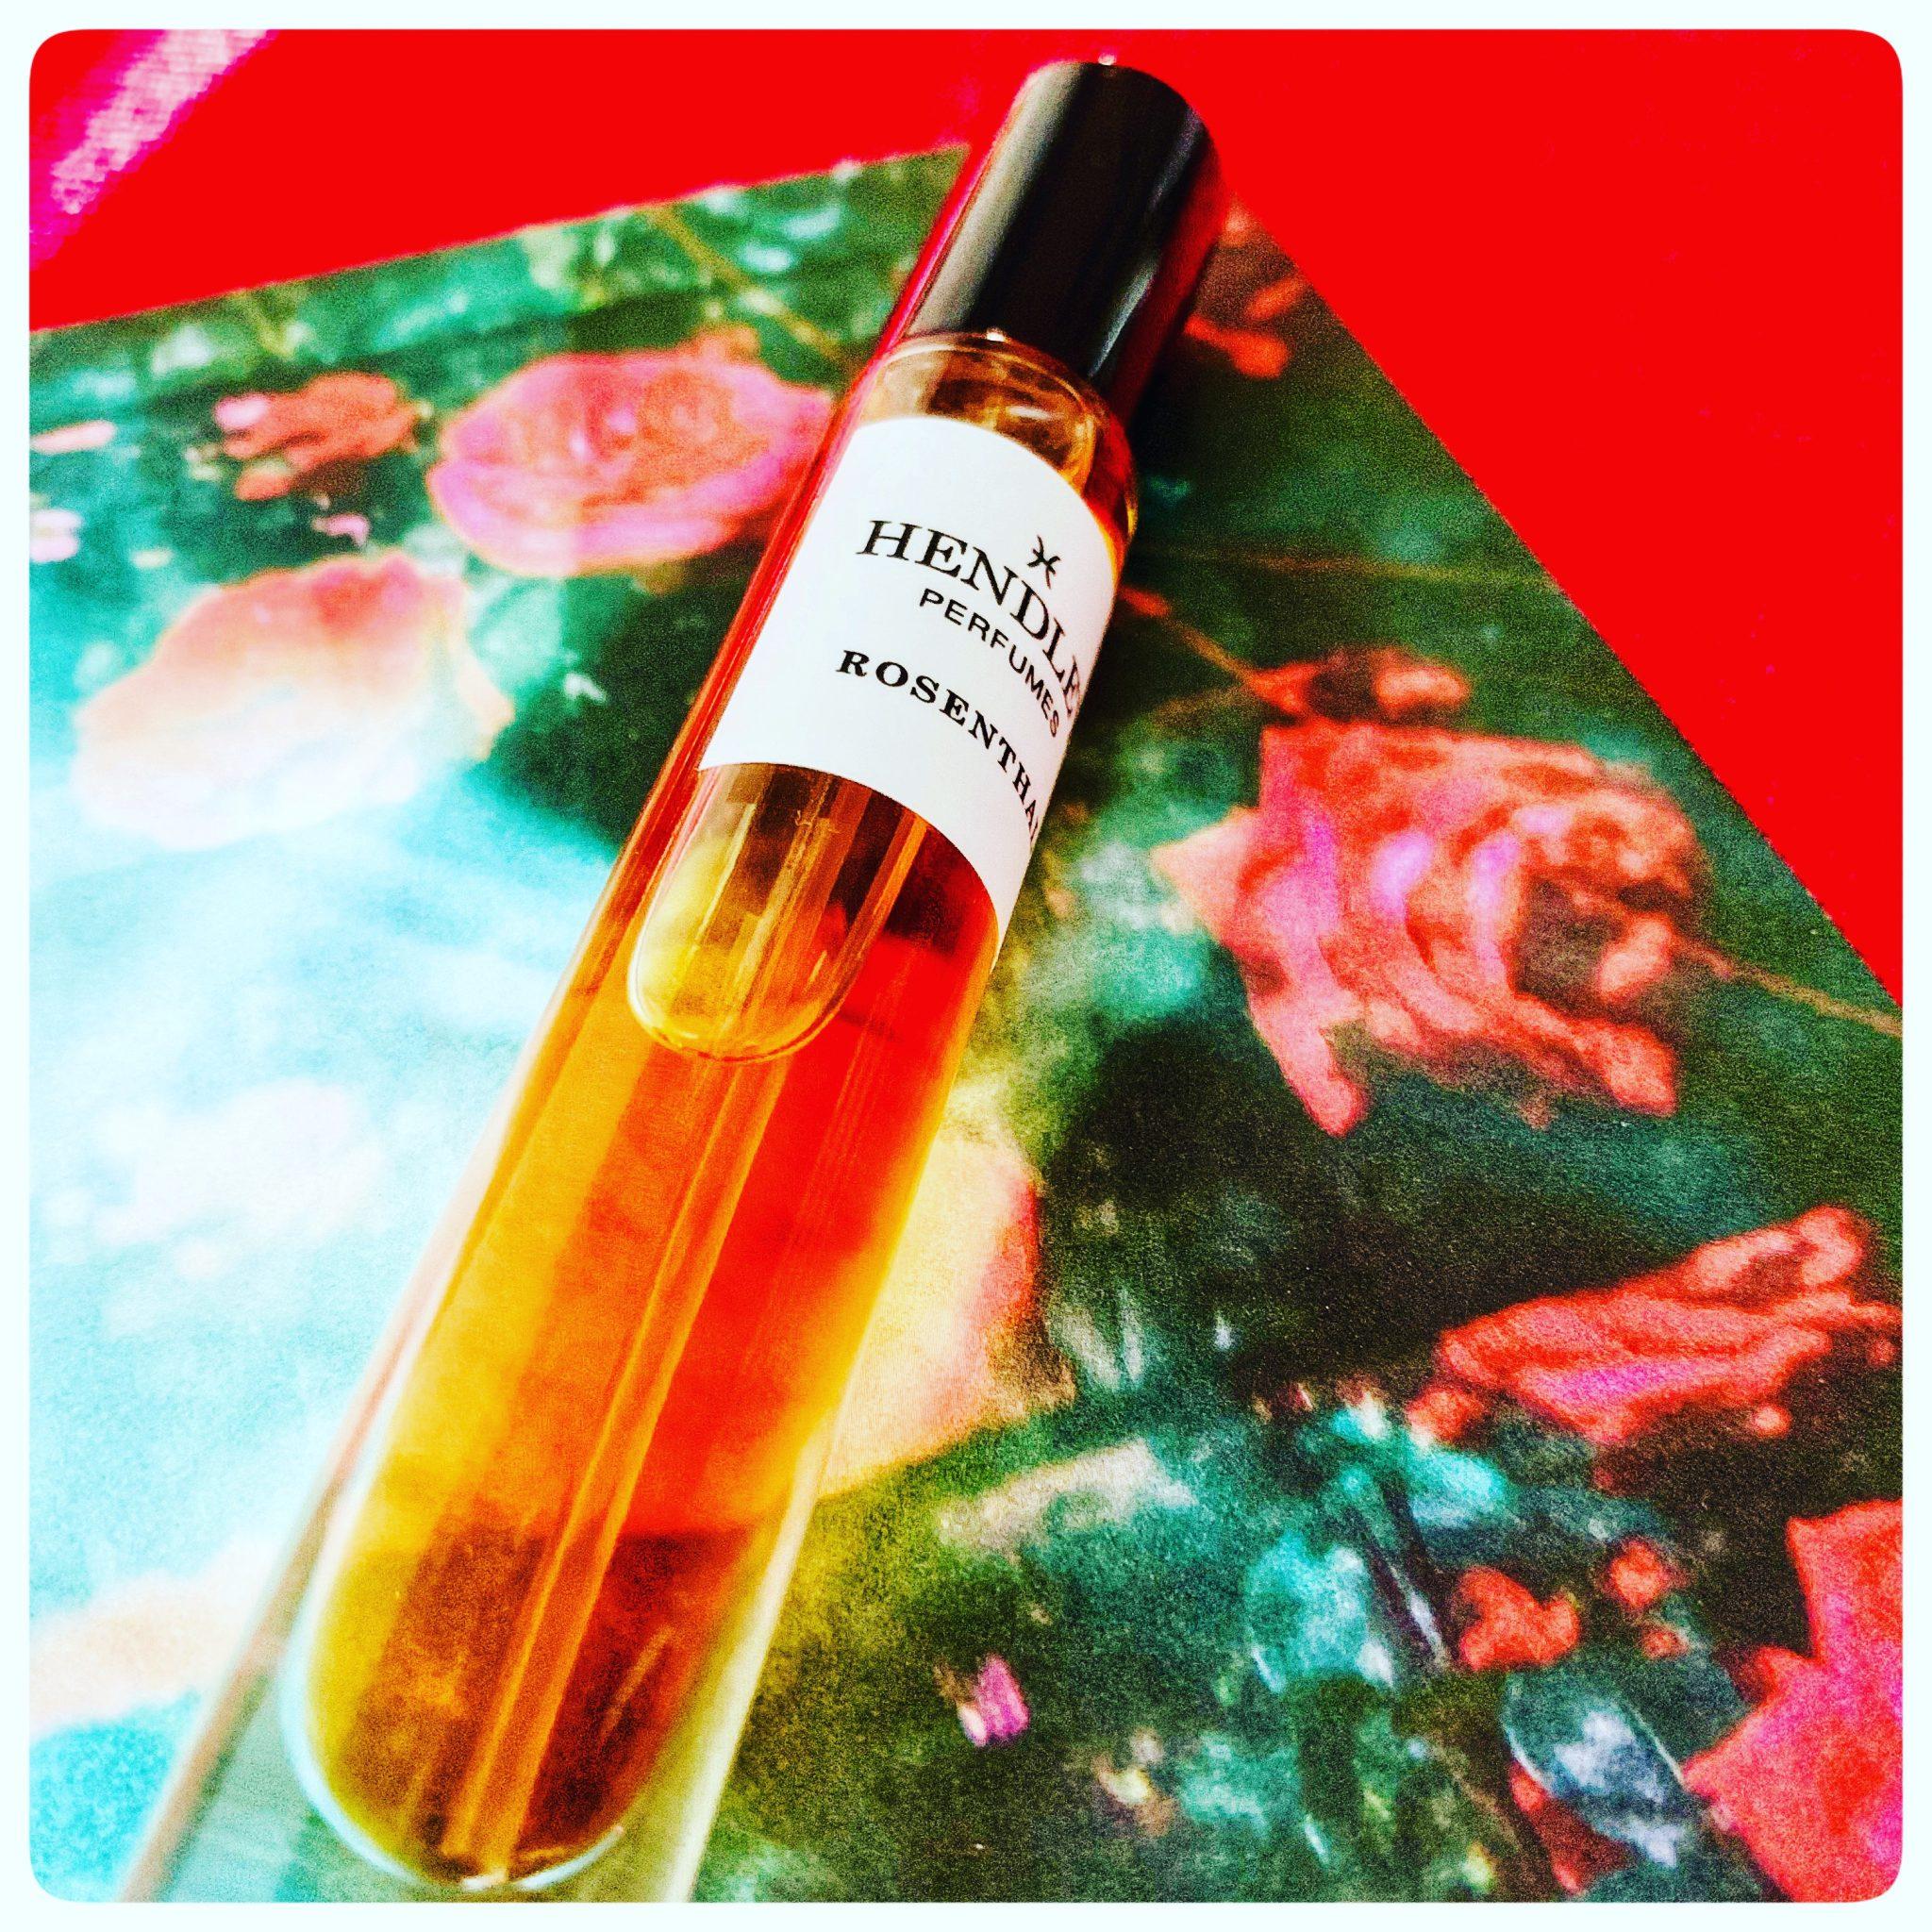 hans hendley rosenthal small bottle